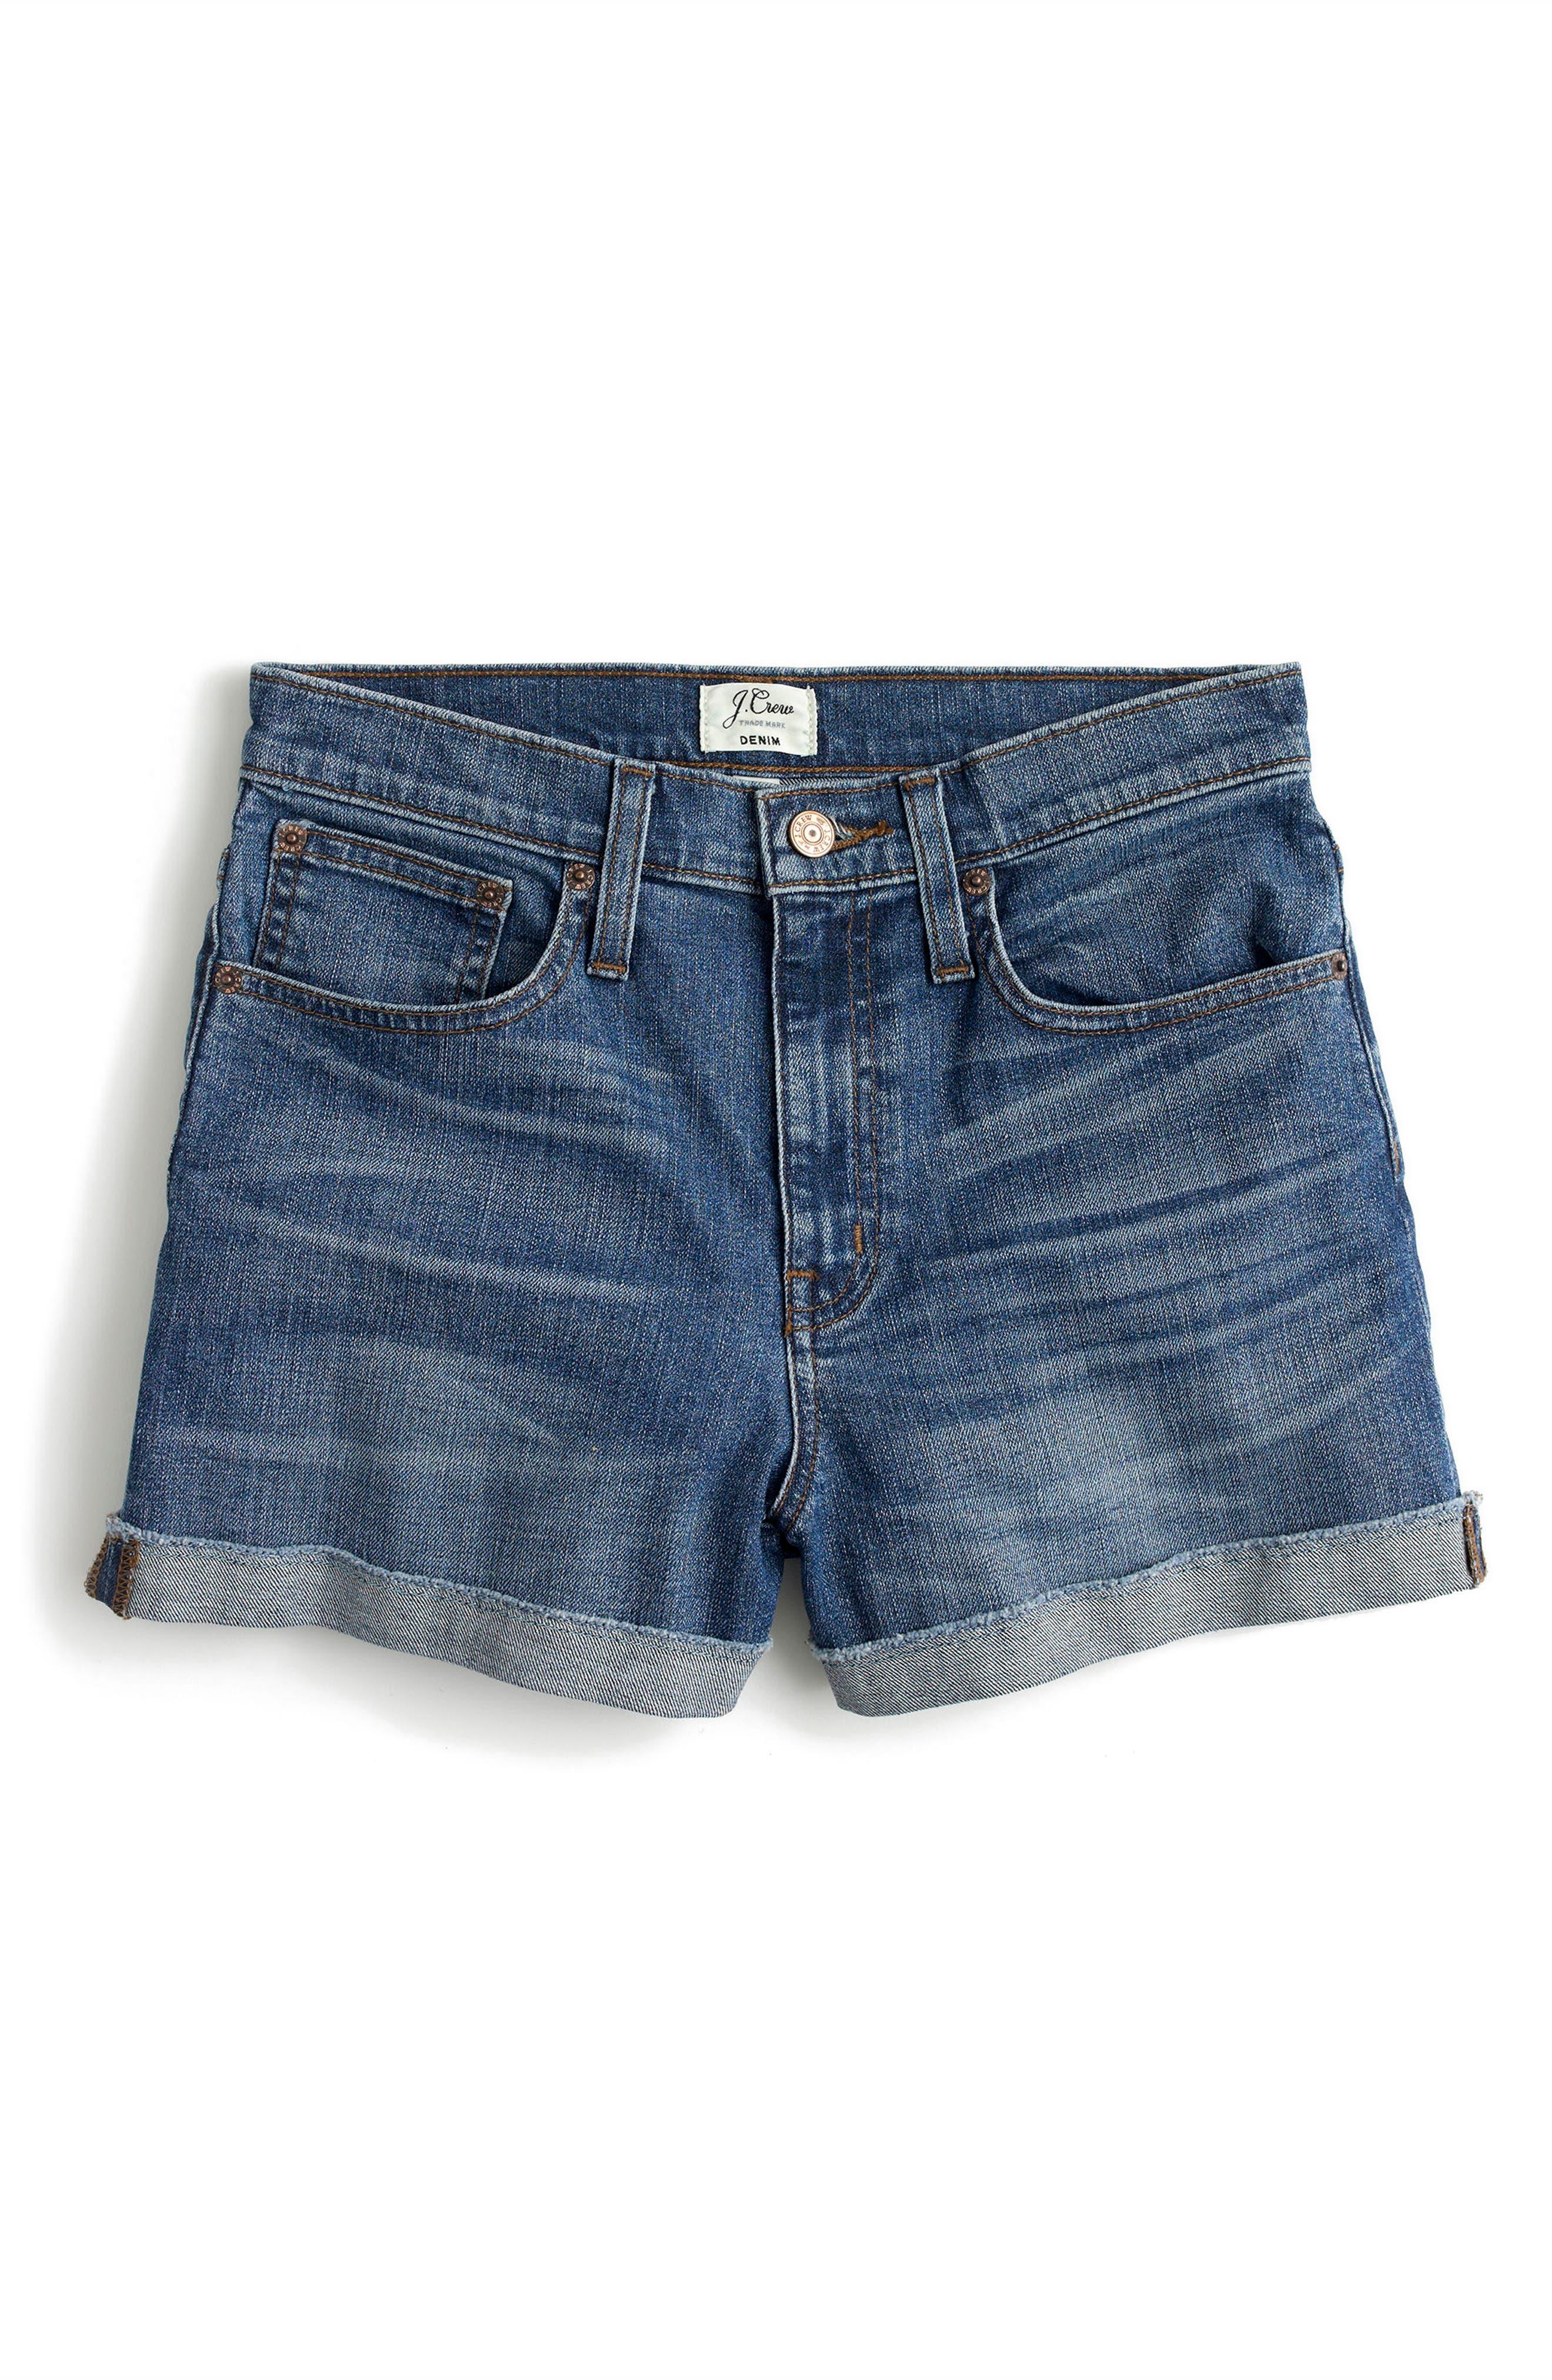 High Rise Denim Shorts,                             Alternate thumbnail 2, color,                             Brixton Wash